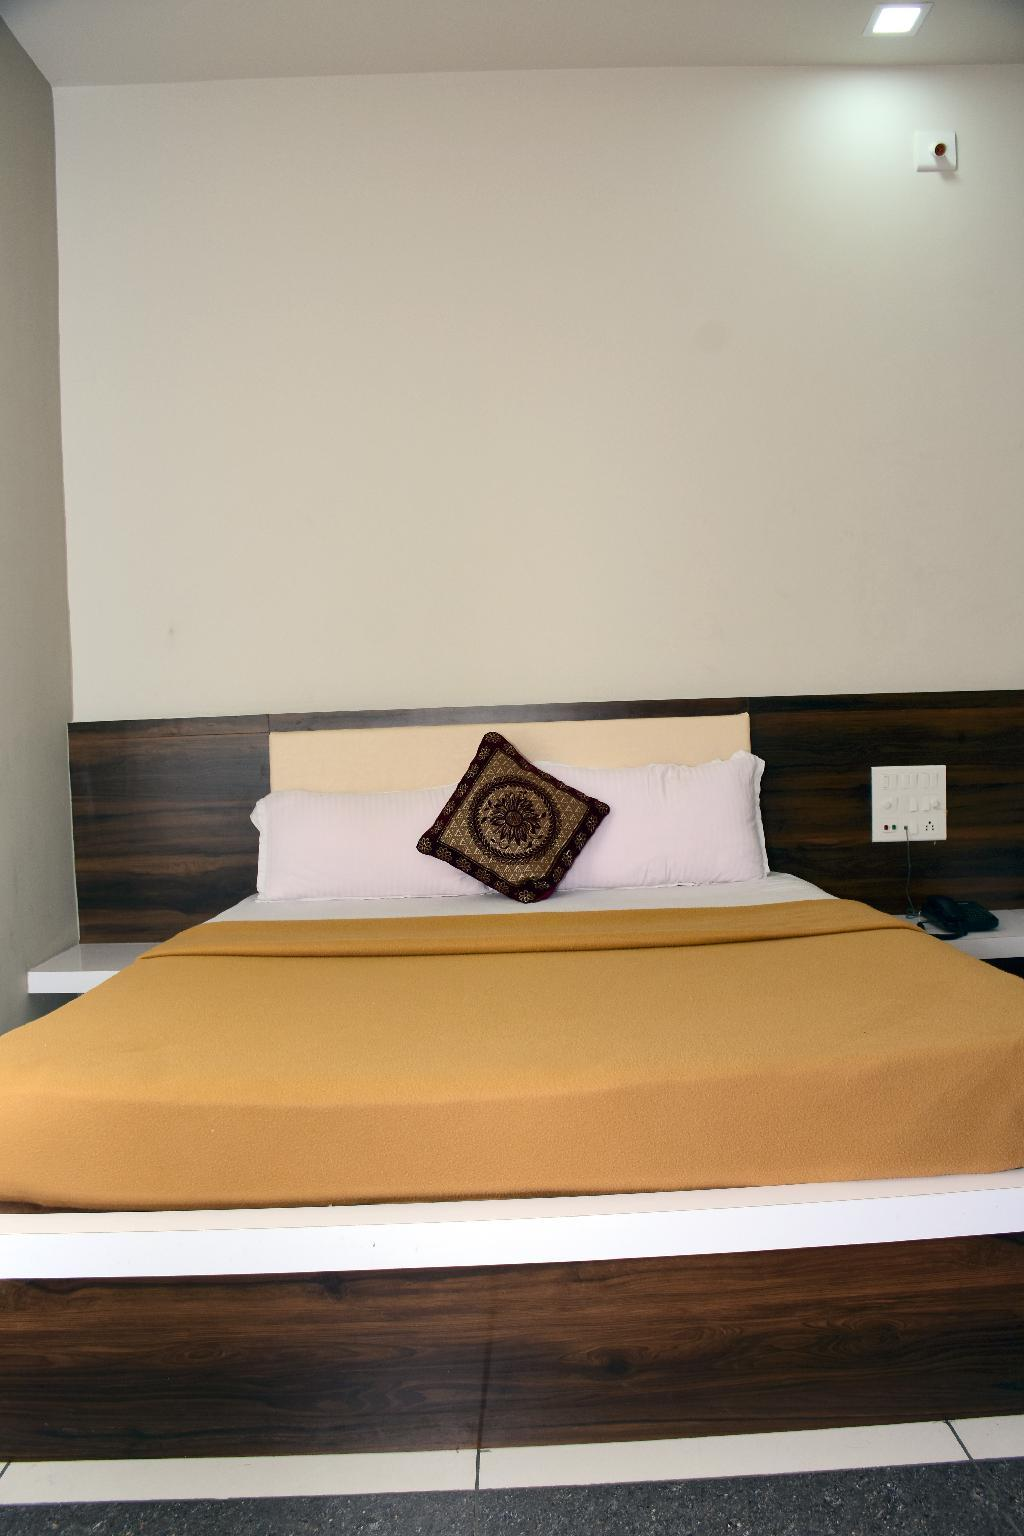 Bhalkeshwar Villa & Resort, Gir Somnath